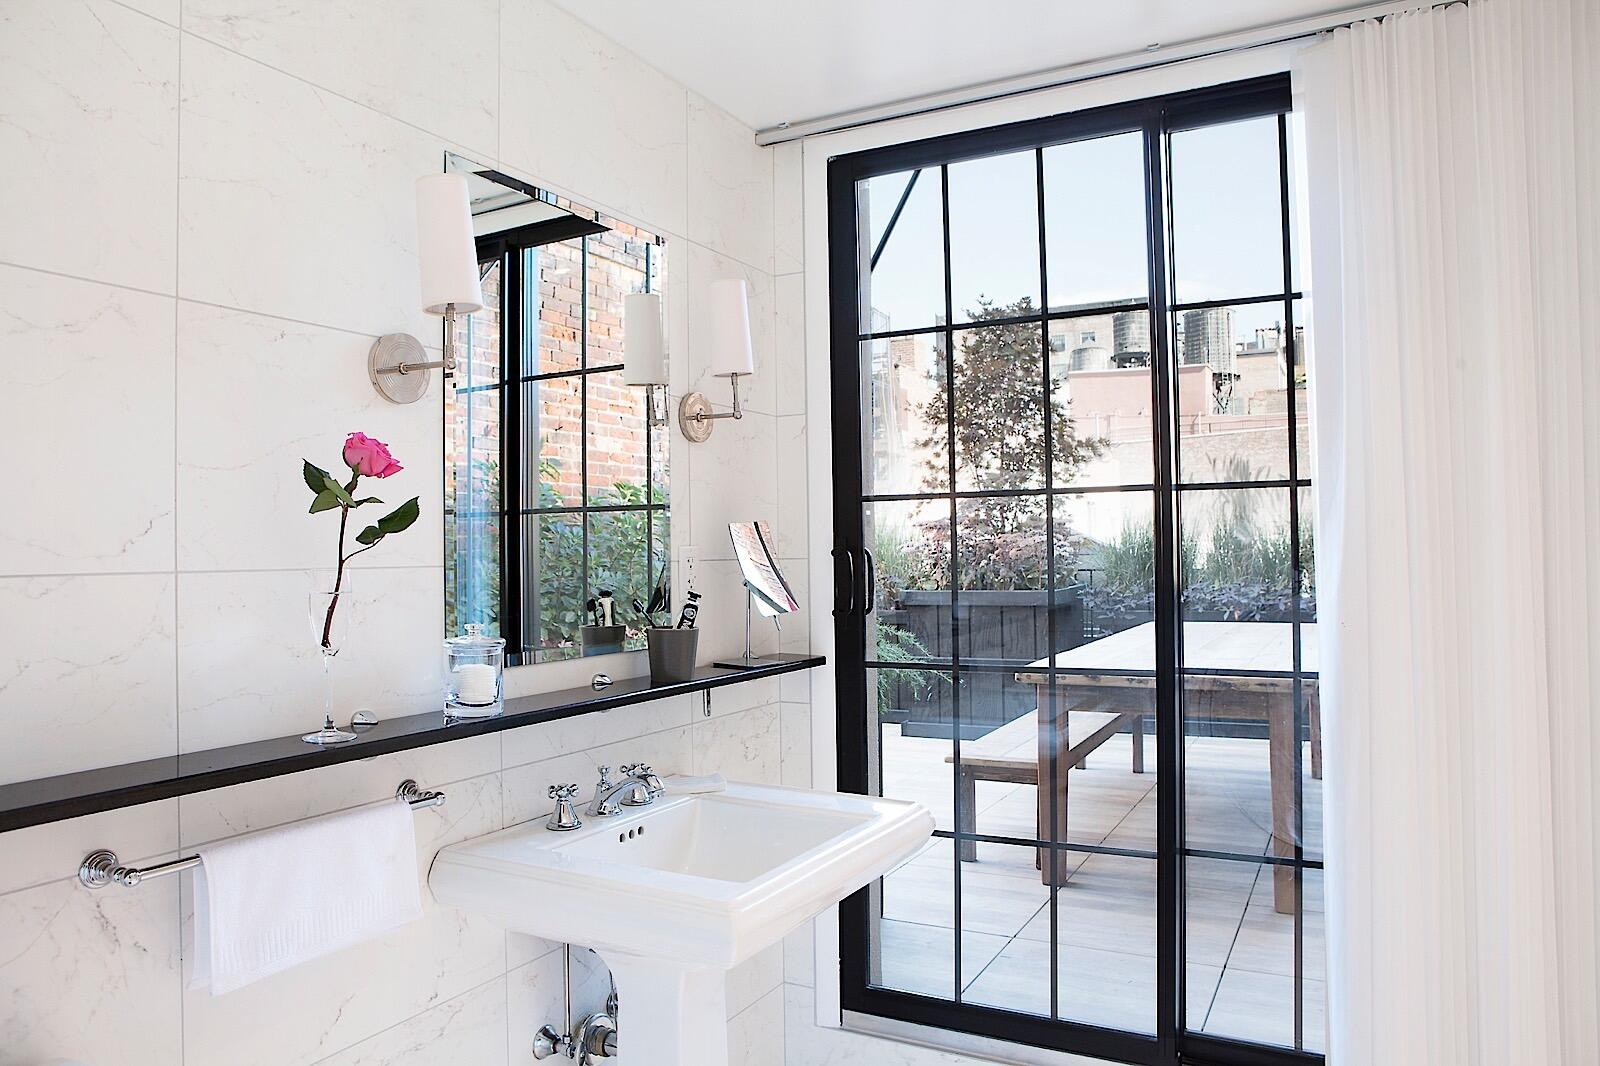 Penthouse Bathroom Interior